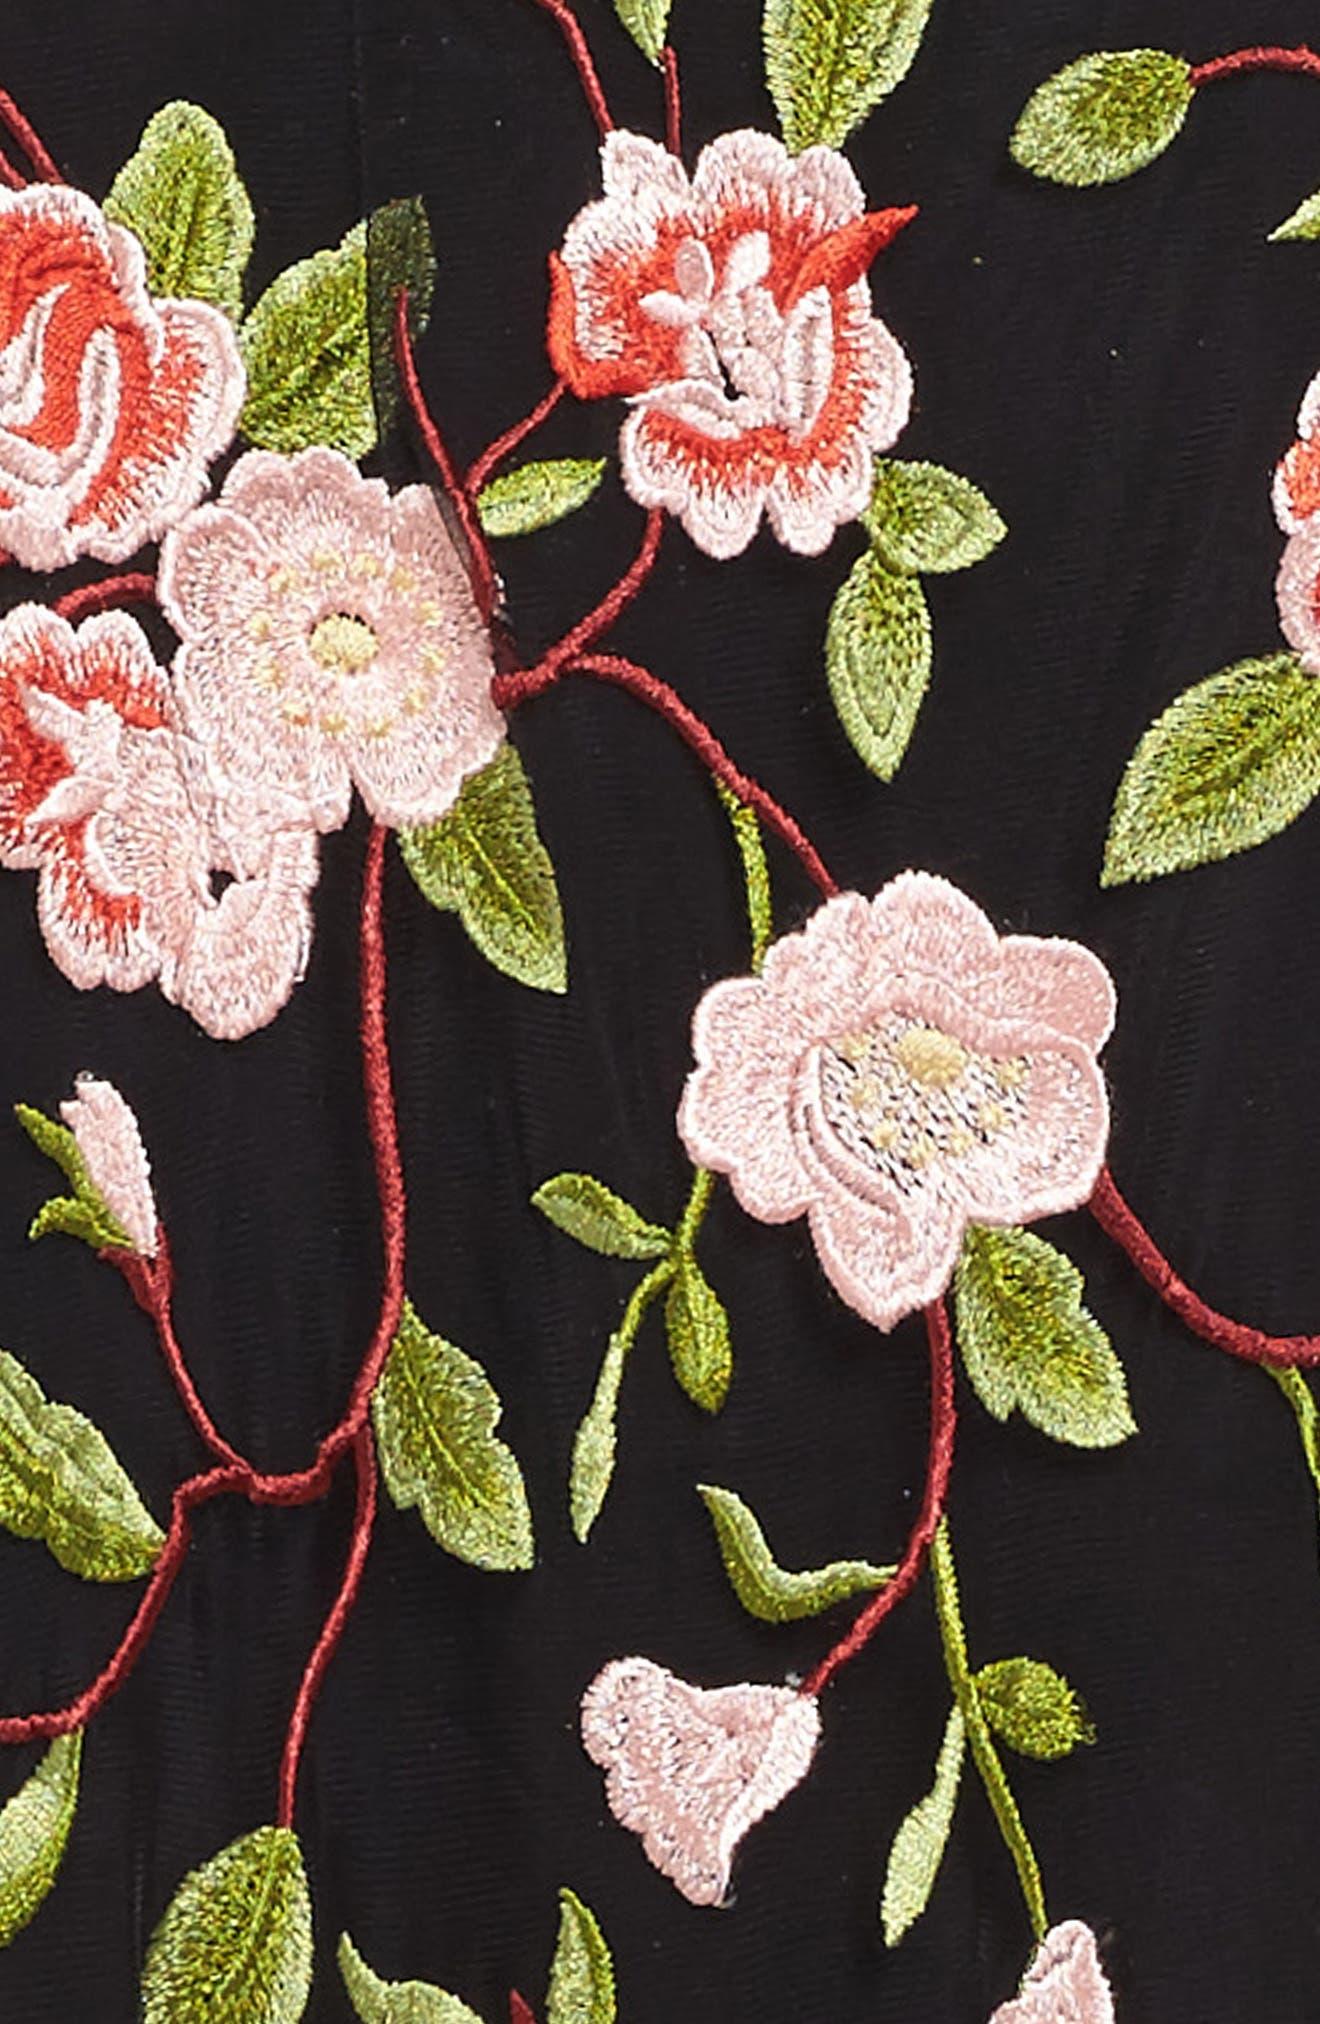 Floral Embroidered Slip Dress,                             Alternate thumbnail 3, color,                             001